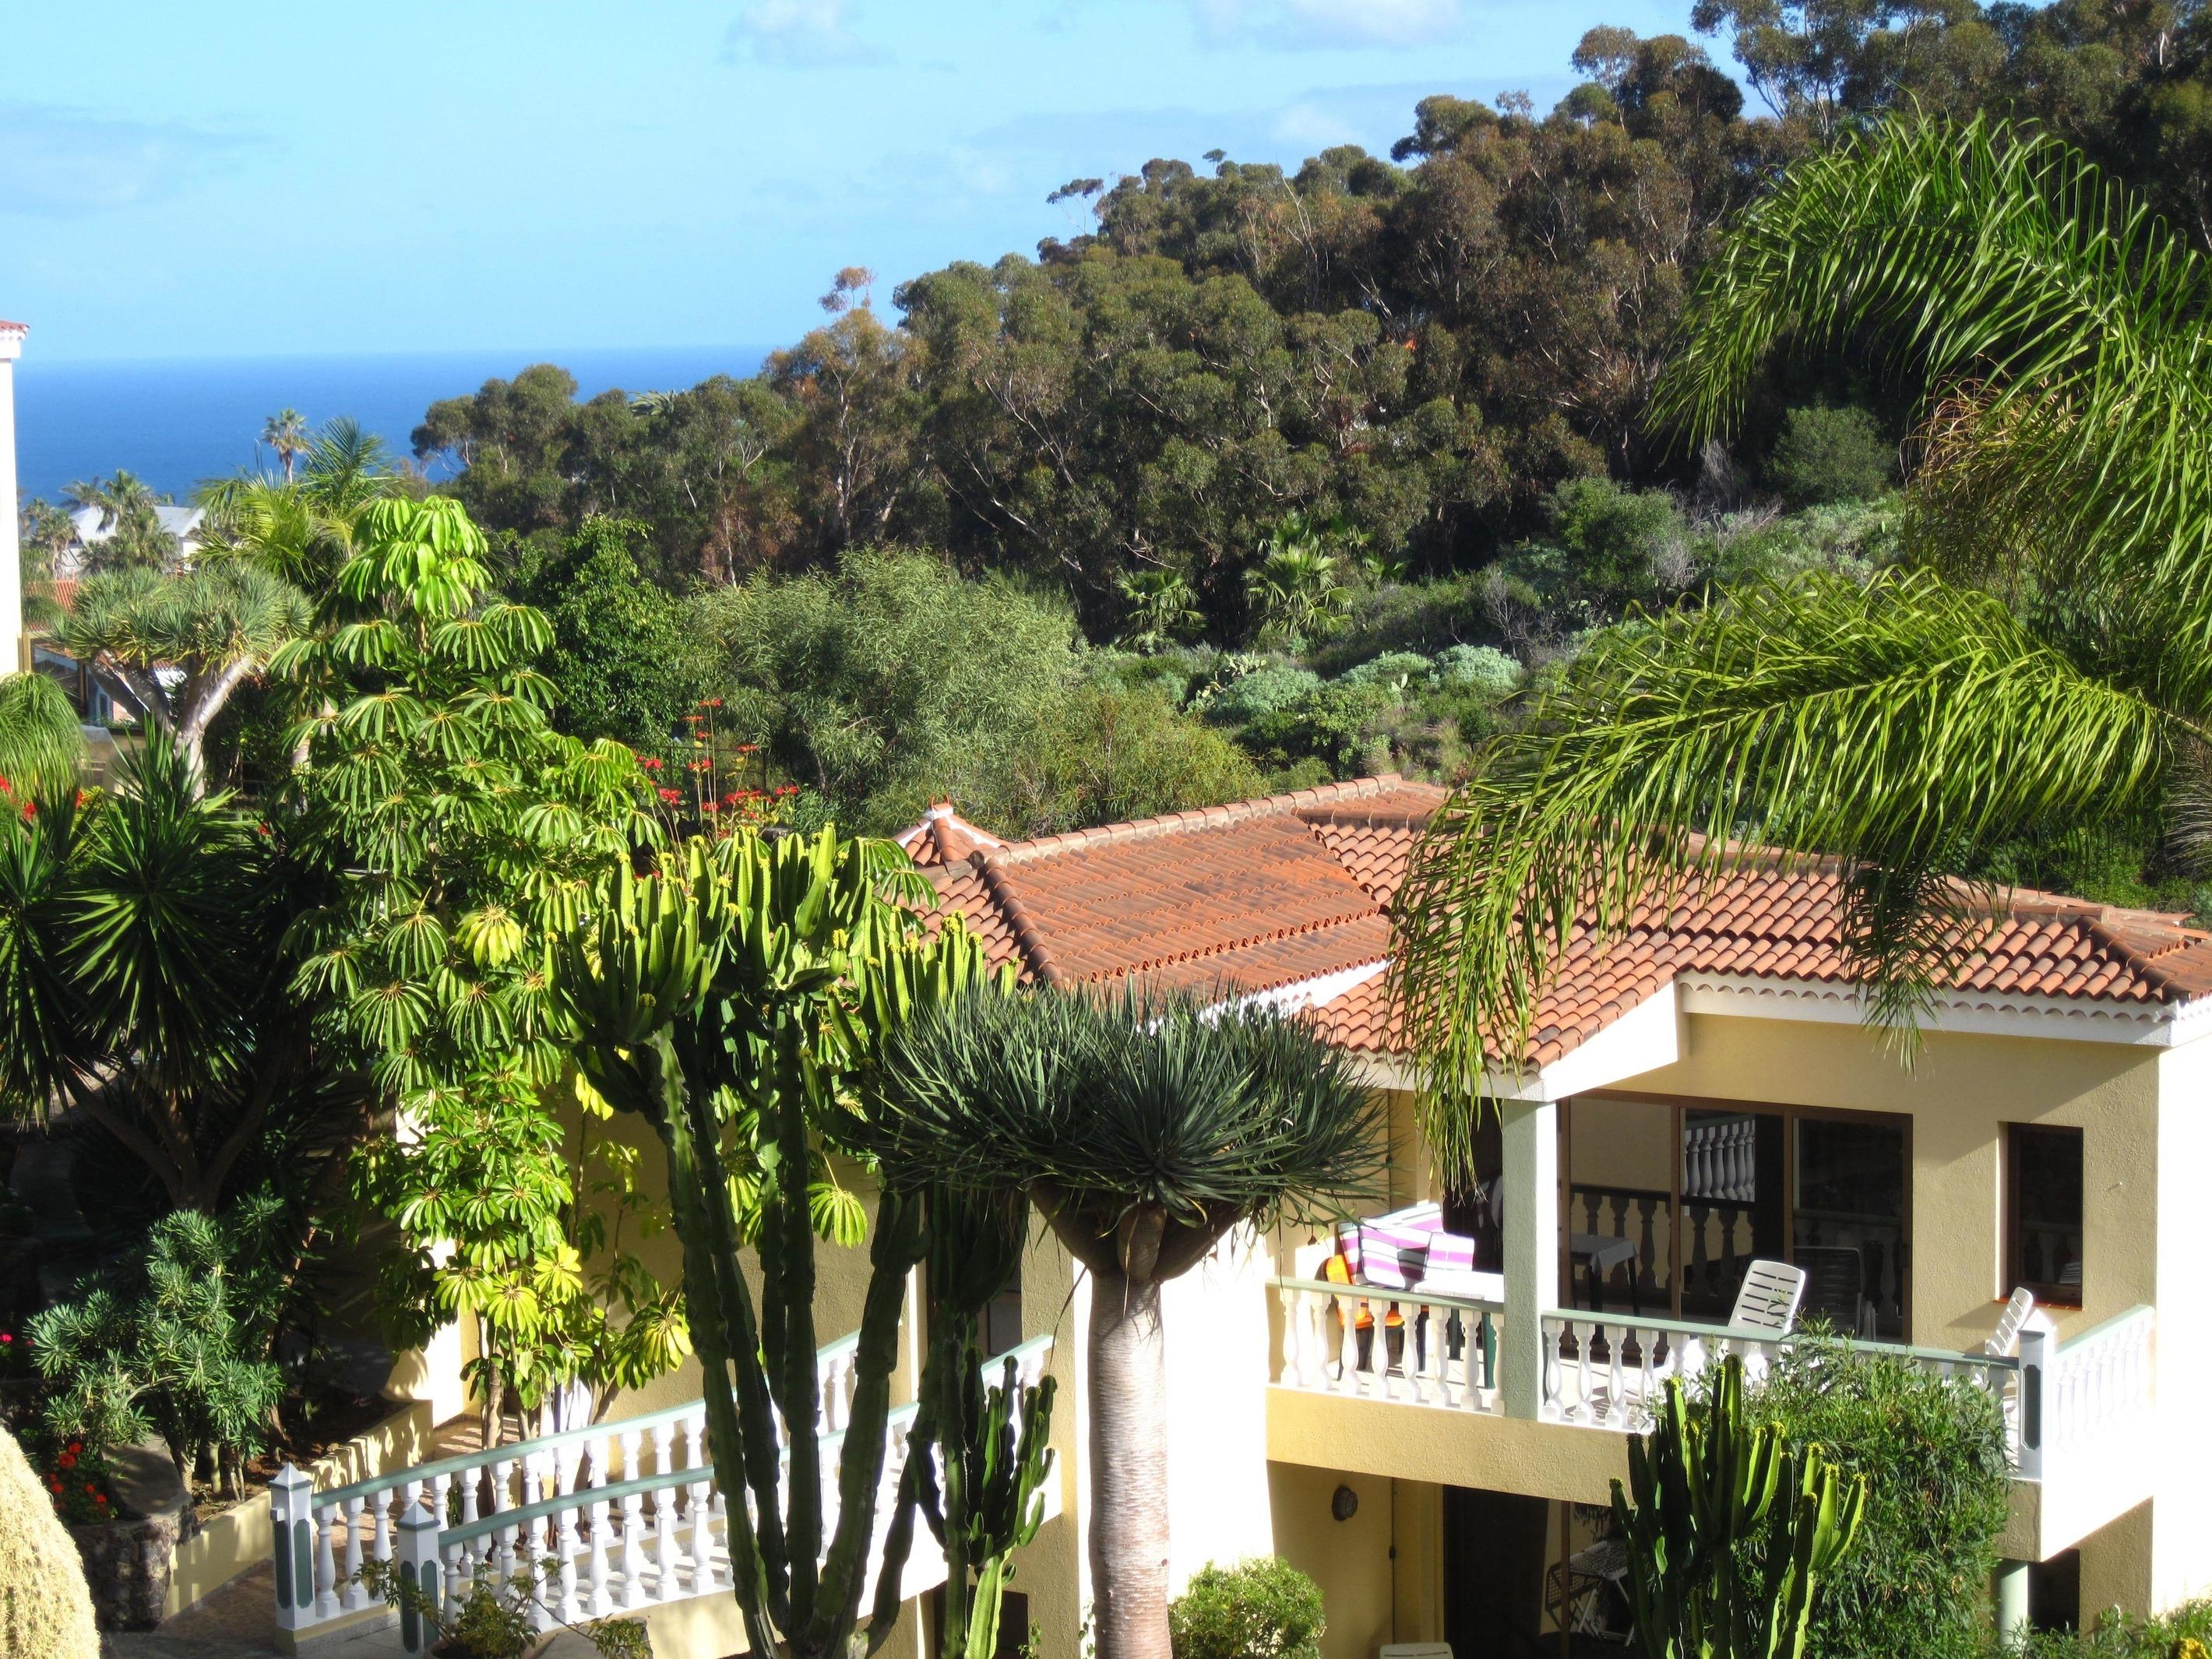 Appartement de vacances Fewo Atico Florasol, sehr ruhig direkt am Naturschutzgebiet, mit Pool, 2 Terrassen, Grill, (2492983), Santa Ursula, Ténérife, Iles Canaries, Espagne, image 15